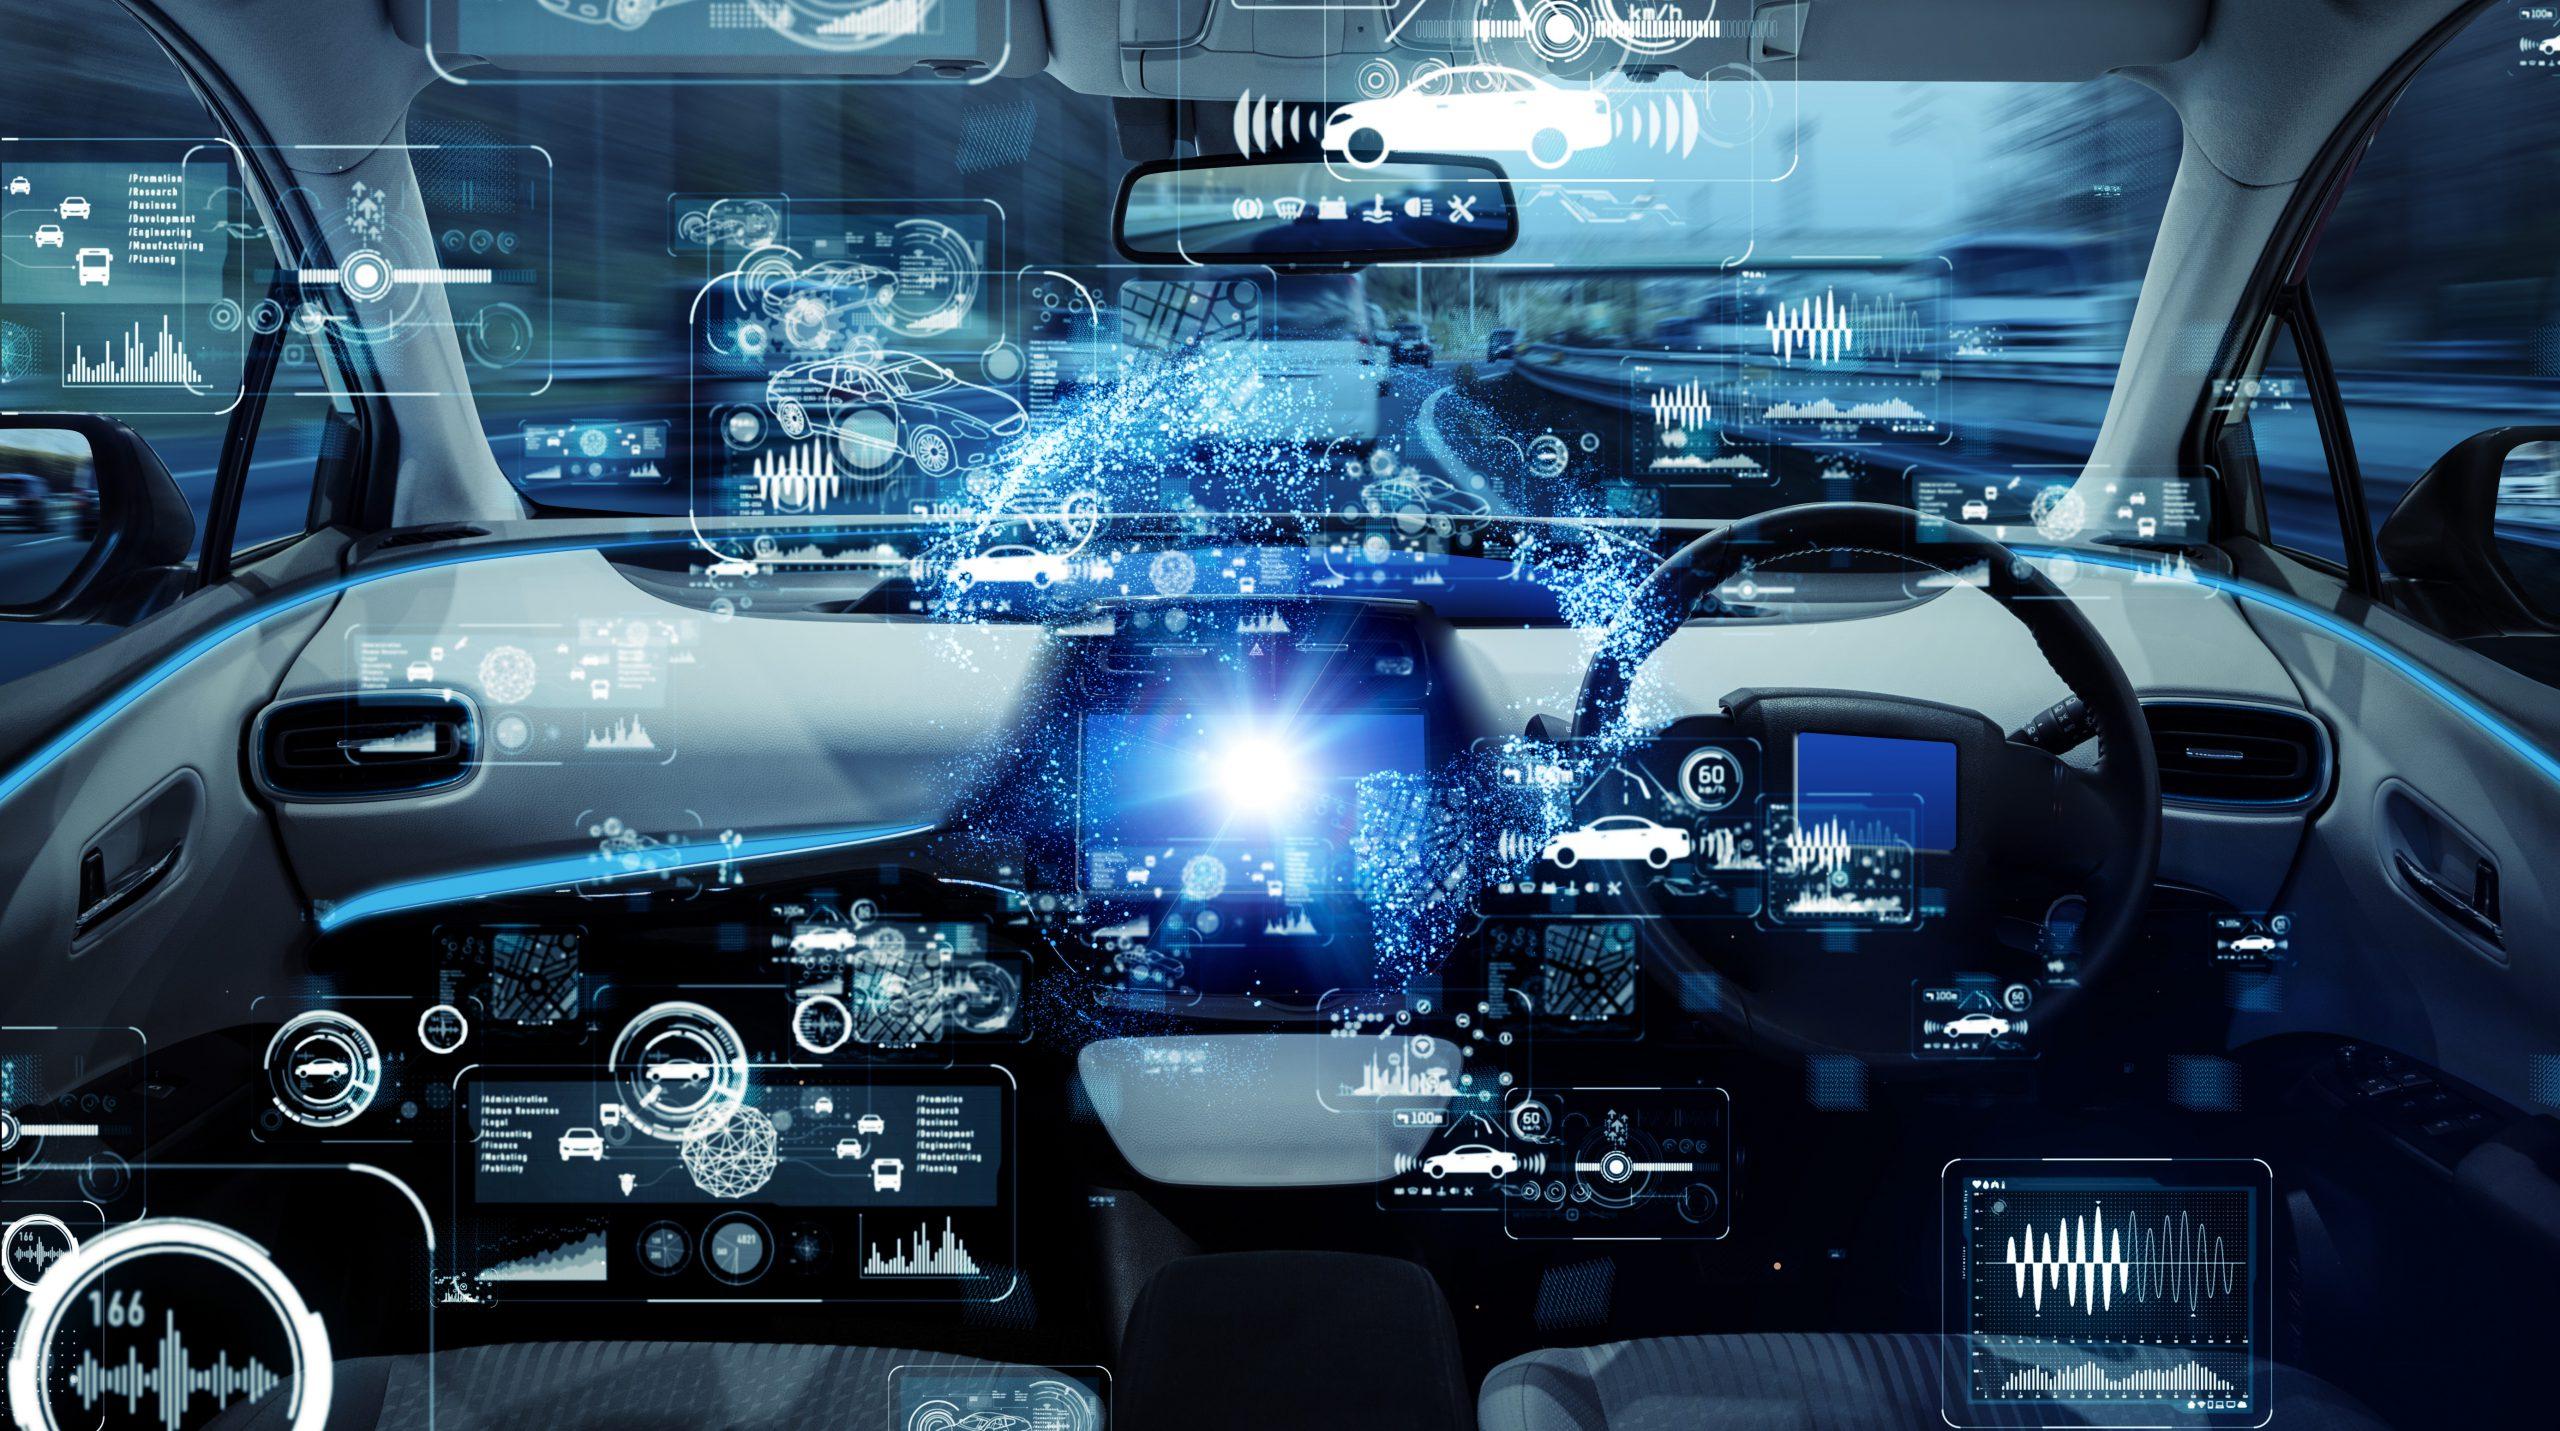 AUTOSAR開発体験キット「メモリ保護編」発売 | FUJISOFT Technical Report